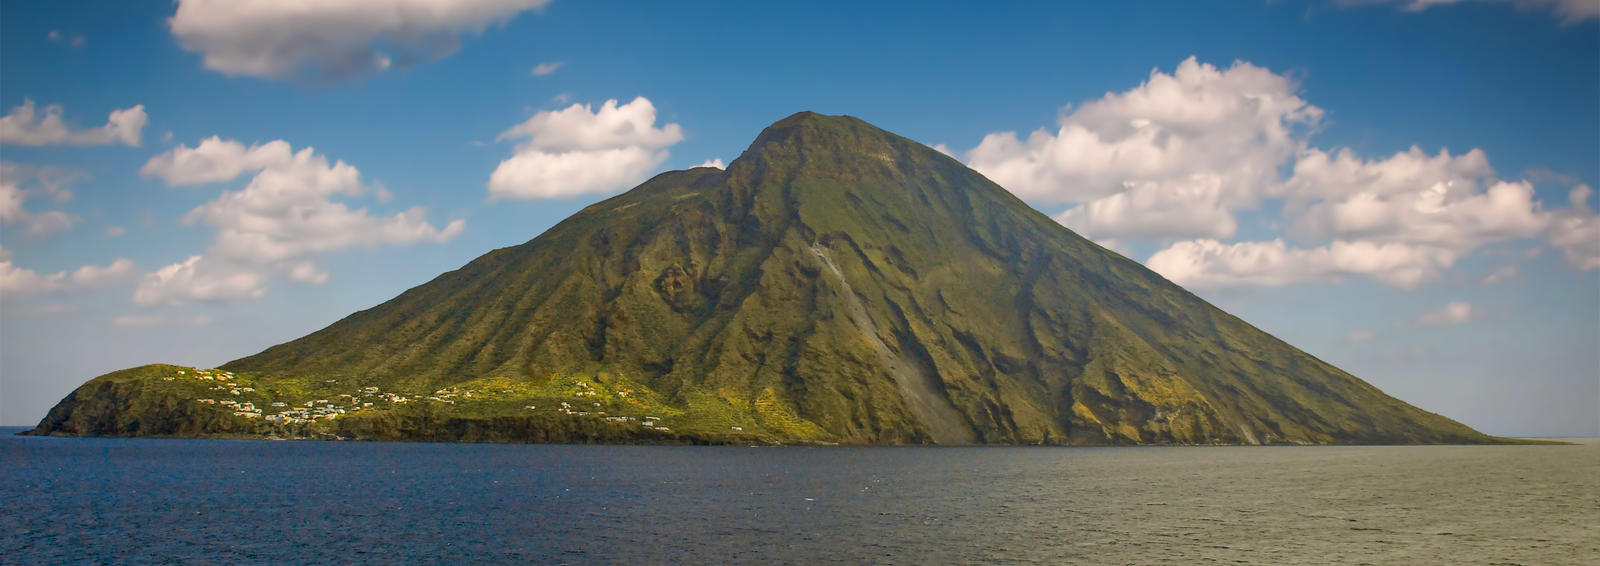 Sicilian Volcanoes 1